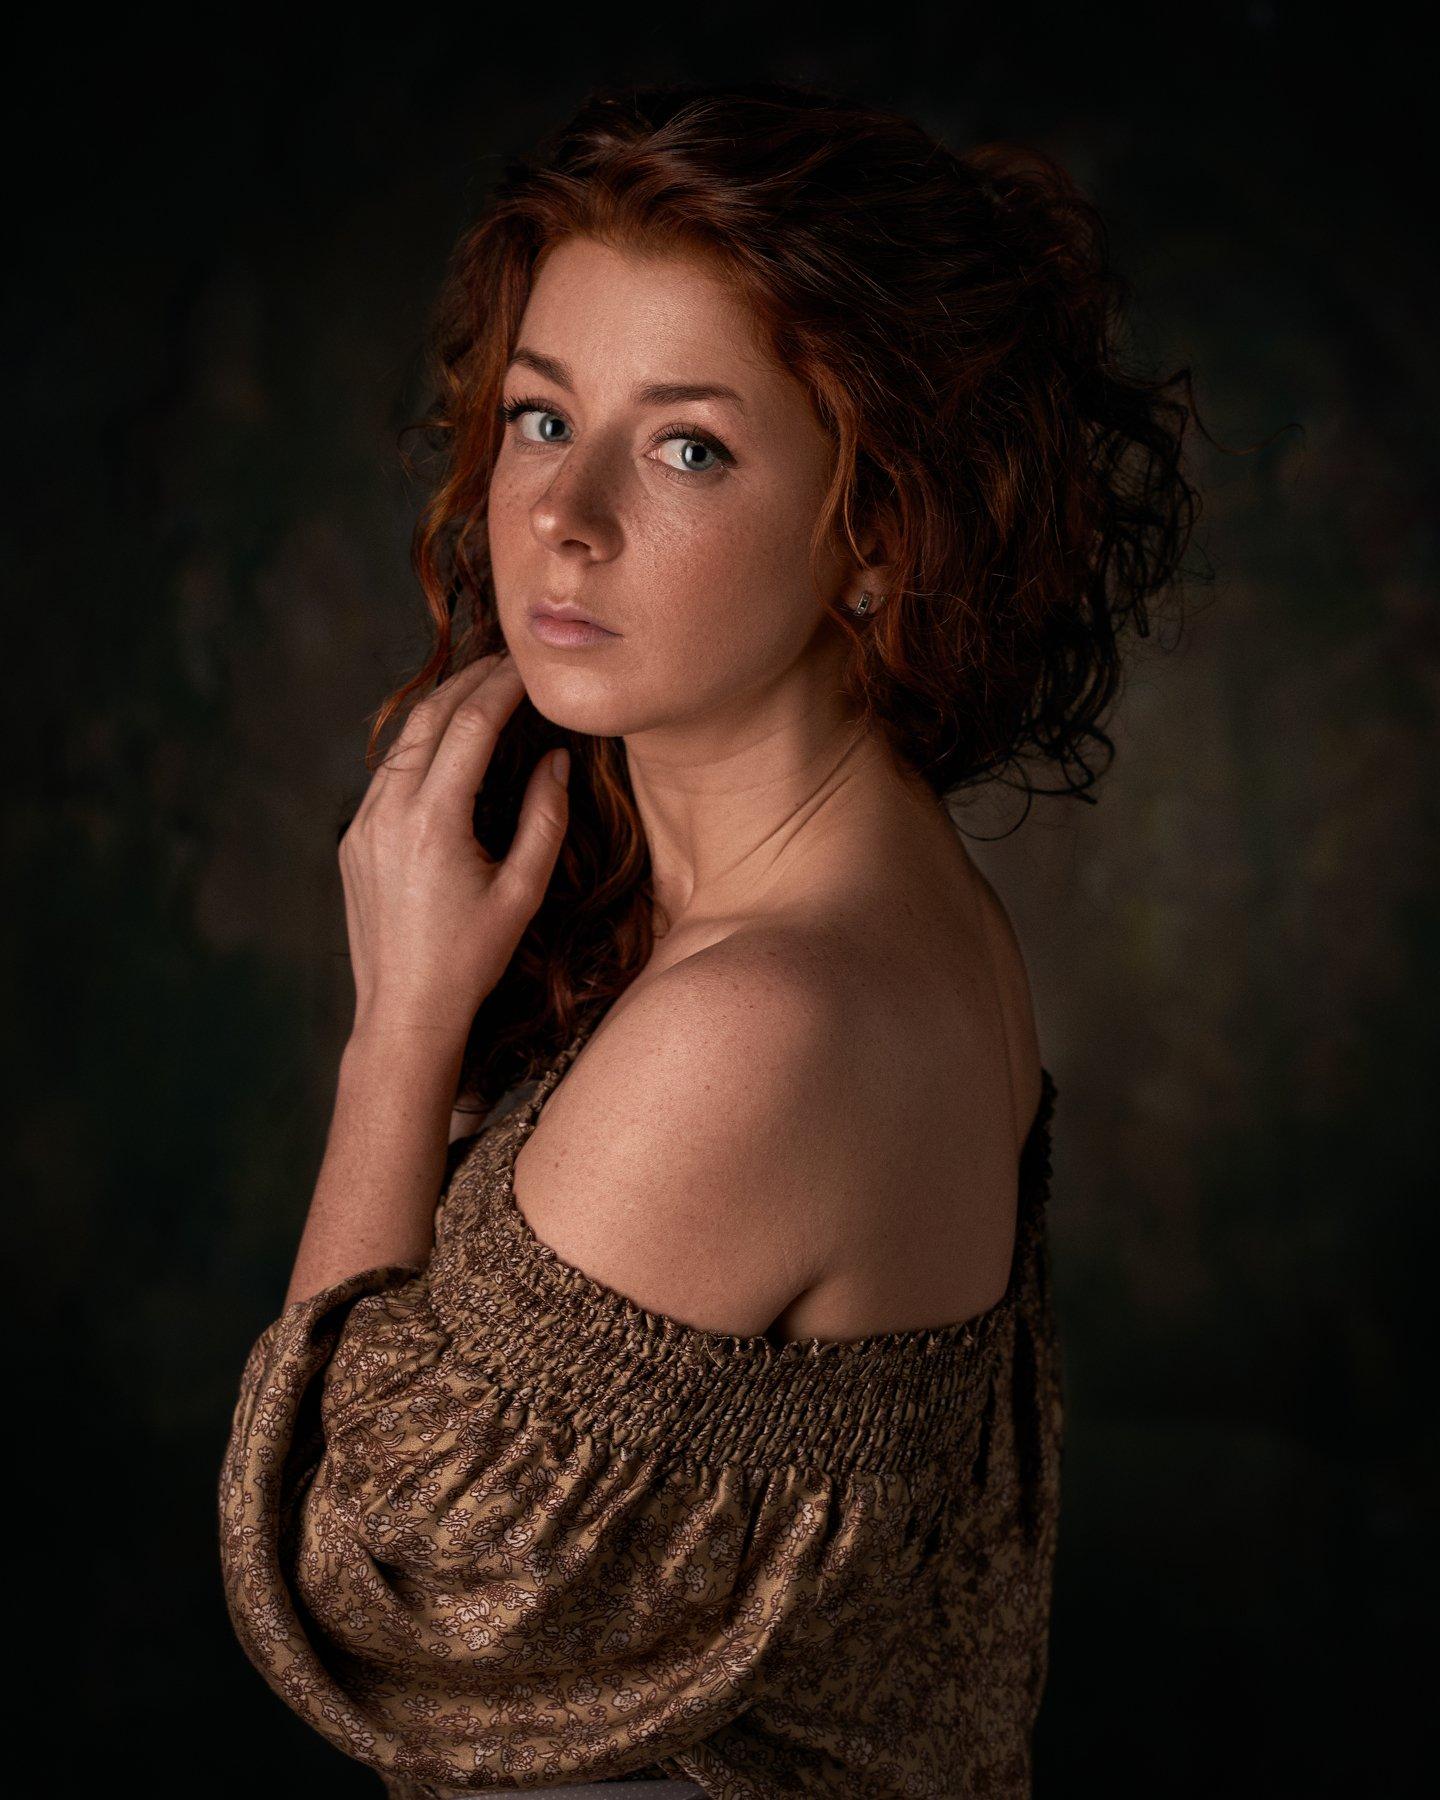 pyzhikphoto, портрет, классика, классический портрет, портрет девушки, женский портрет, portrait, classic, art, красавица, фото, девушка, кудри, винтаж, Пыжик Максим